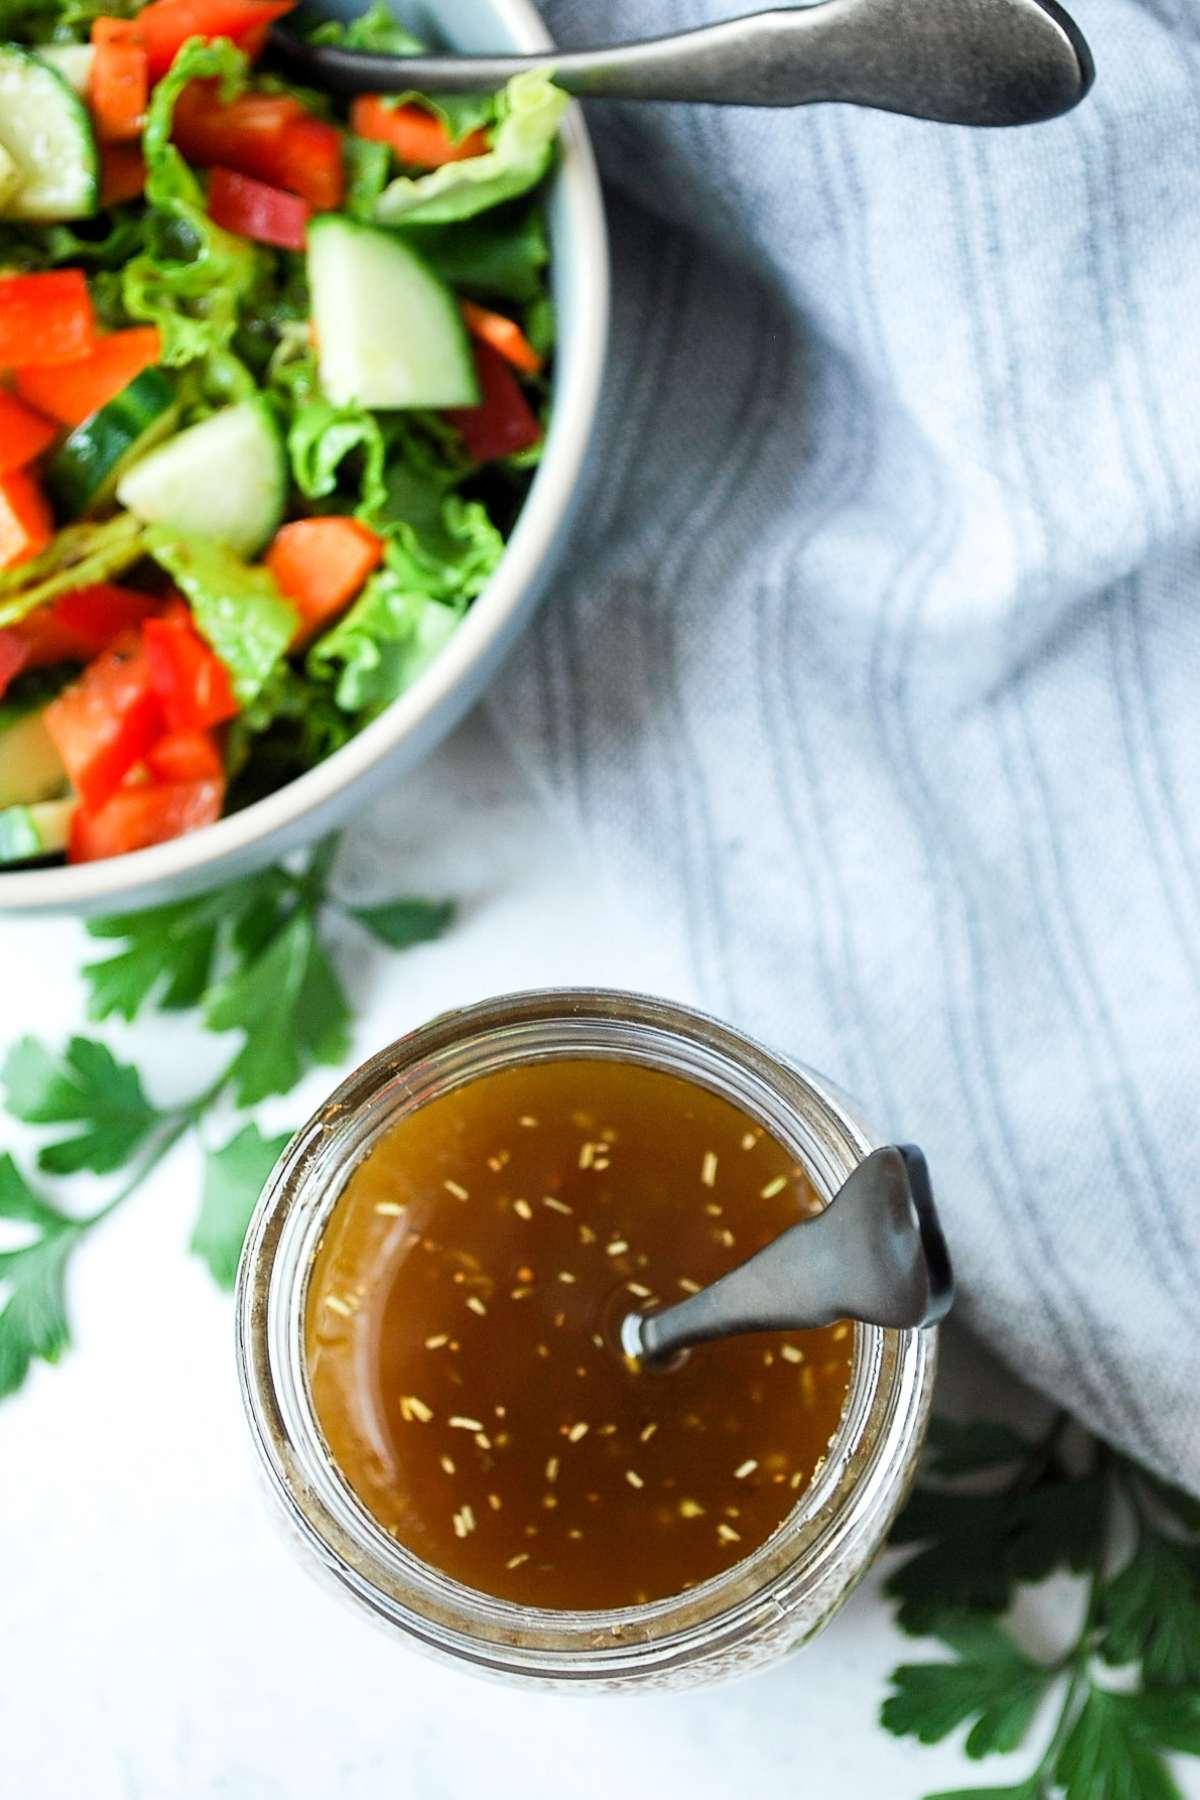 overhead shot of a jar of maple balsamic vinaigrette next to a bowl of garden salad